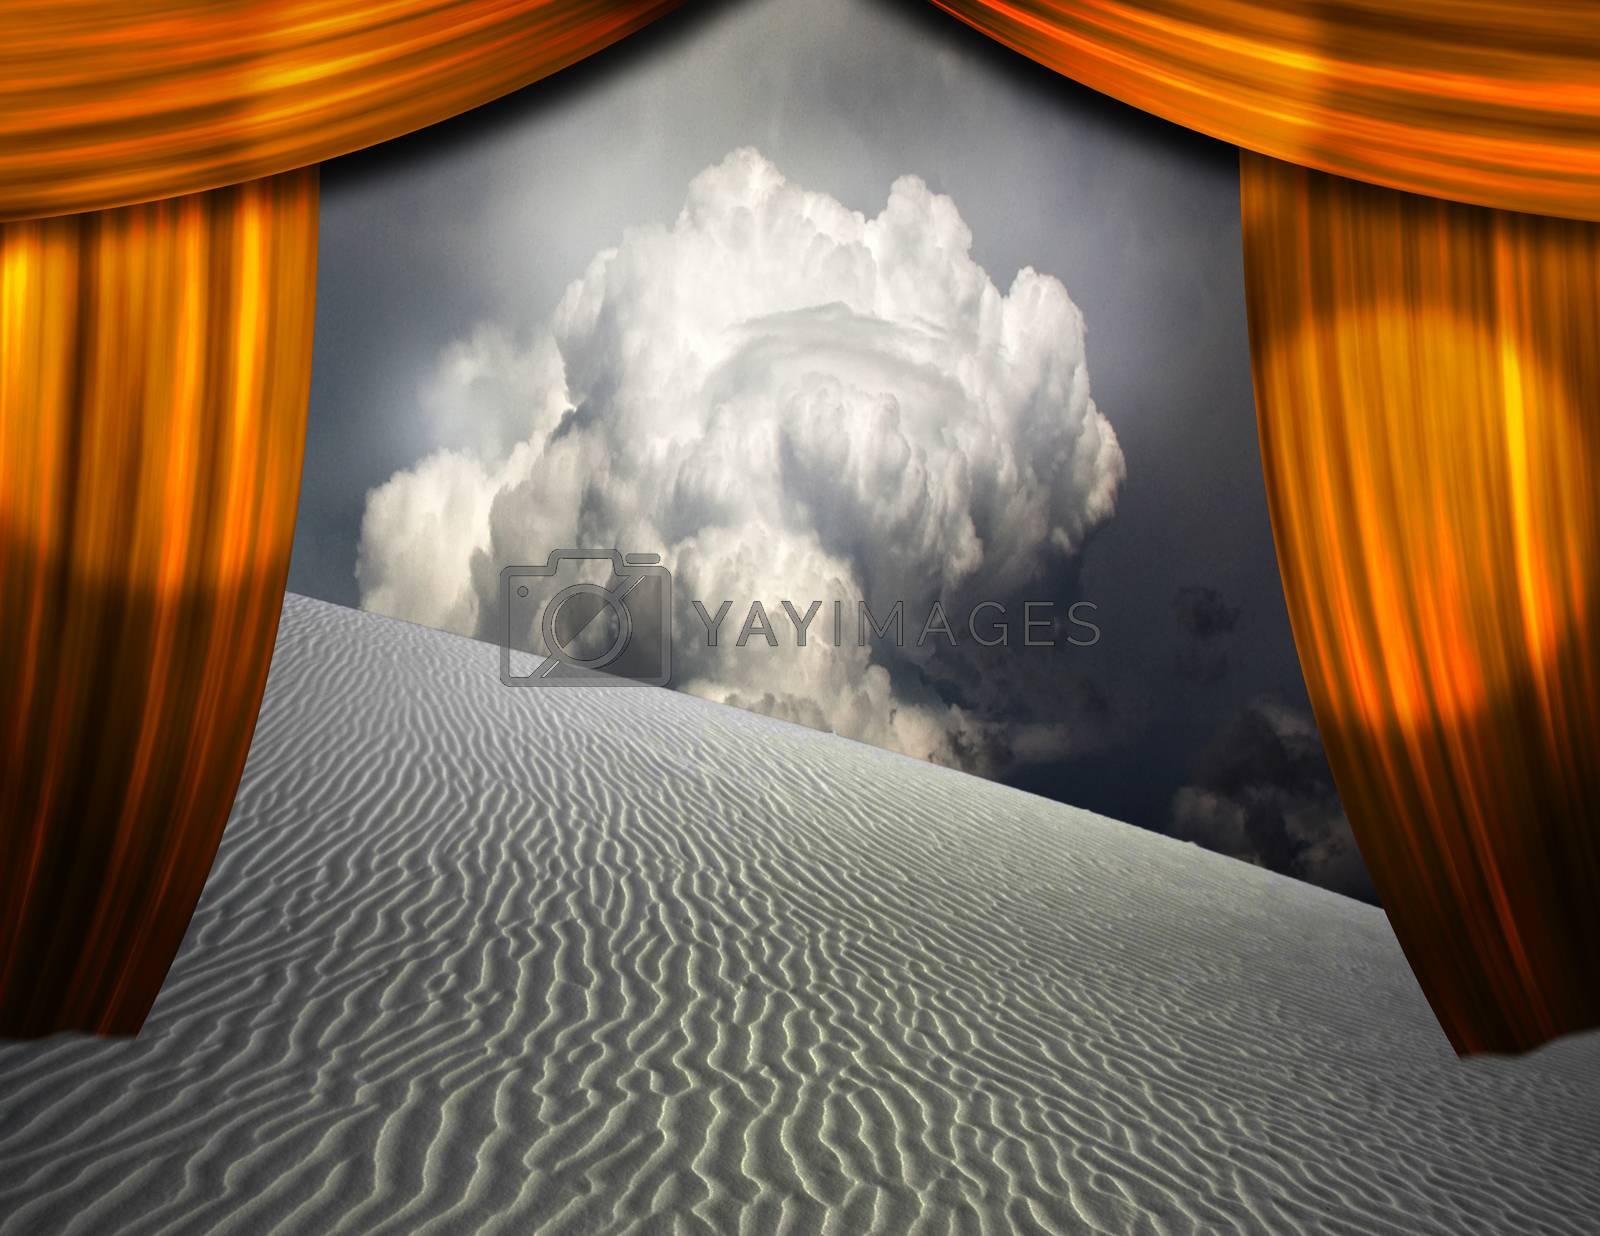 Desert sands seen through opening in curtains. 3D rendering